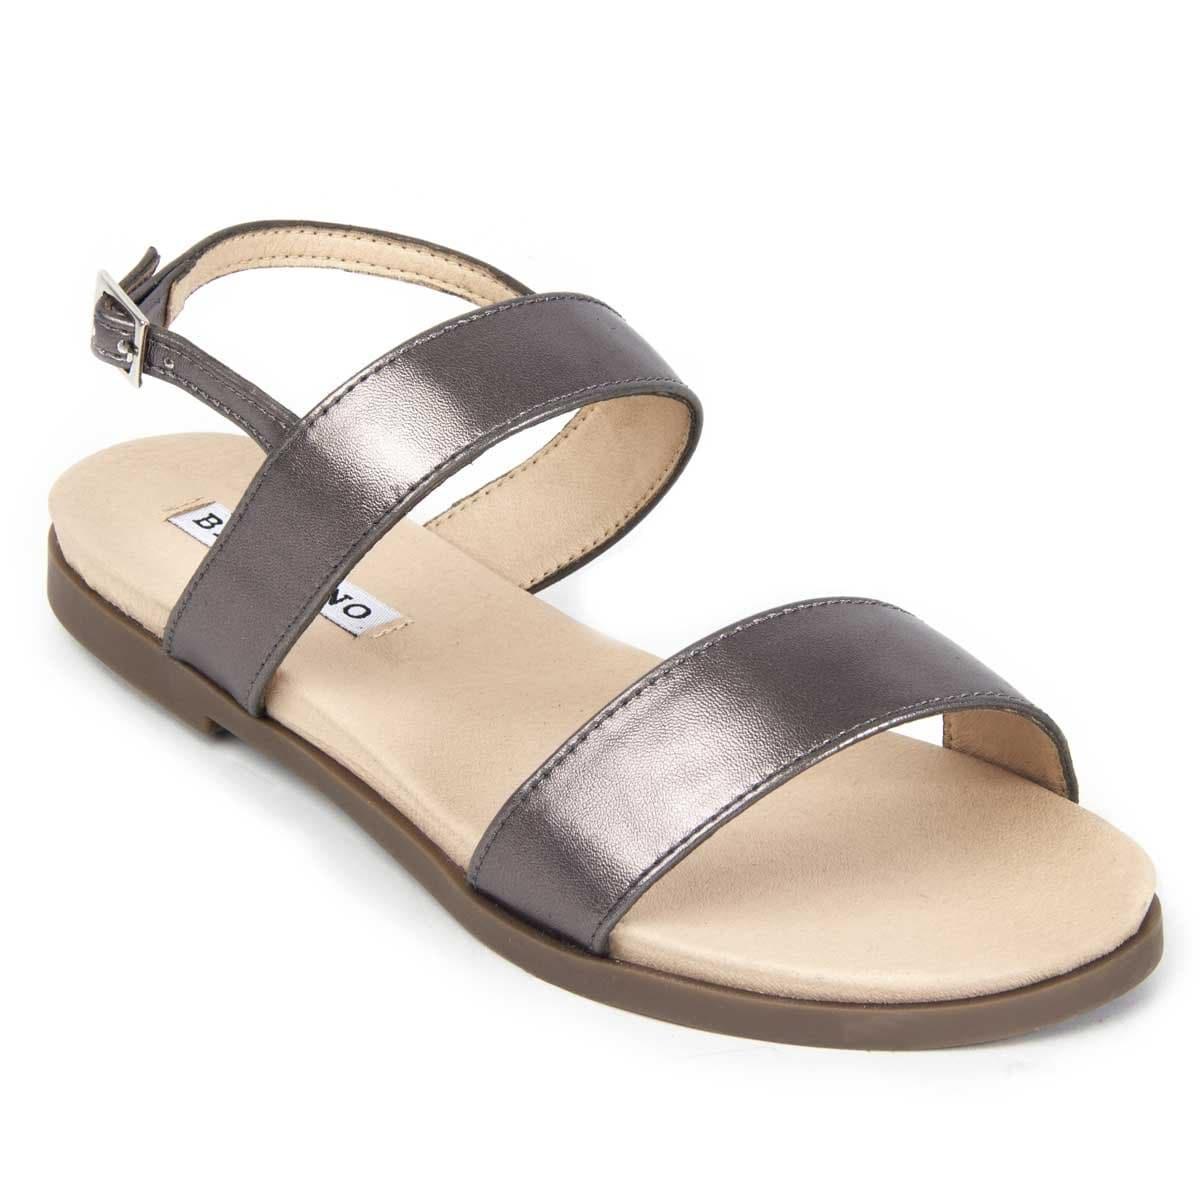 Sandalia de Piso Doble Tira Brantano